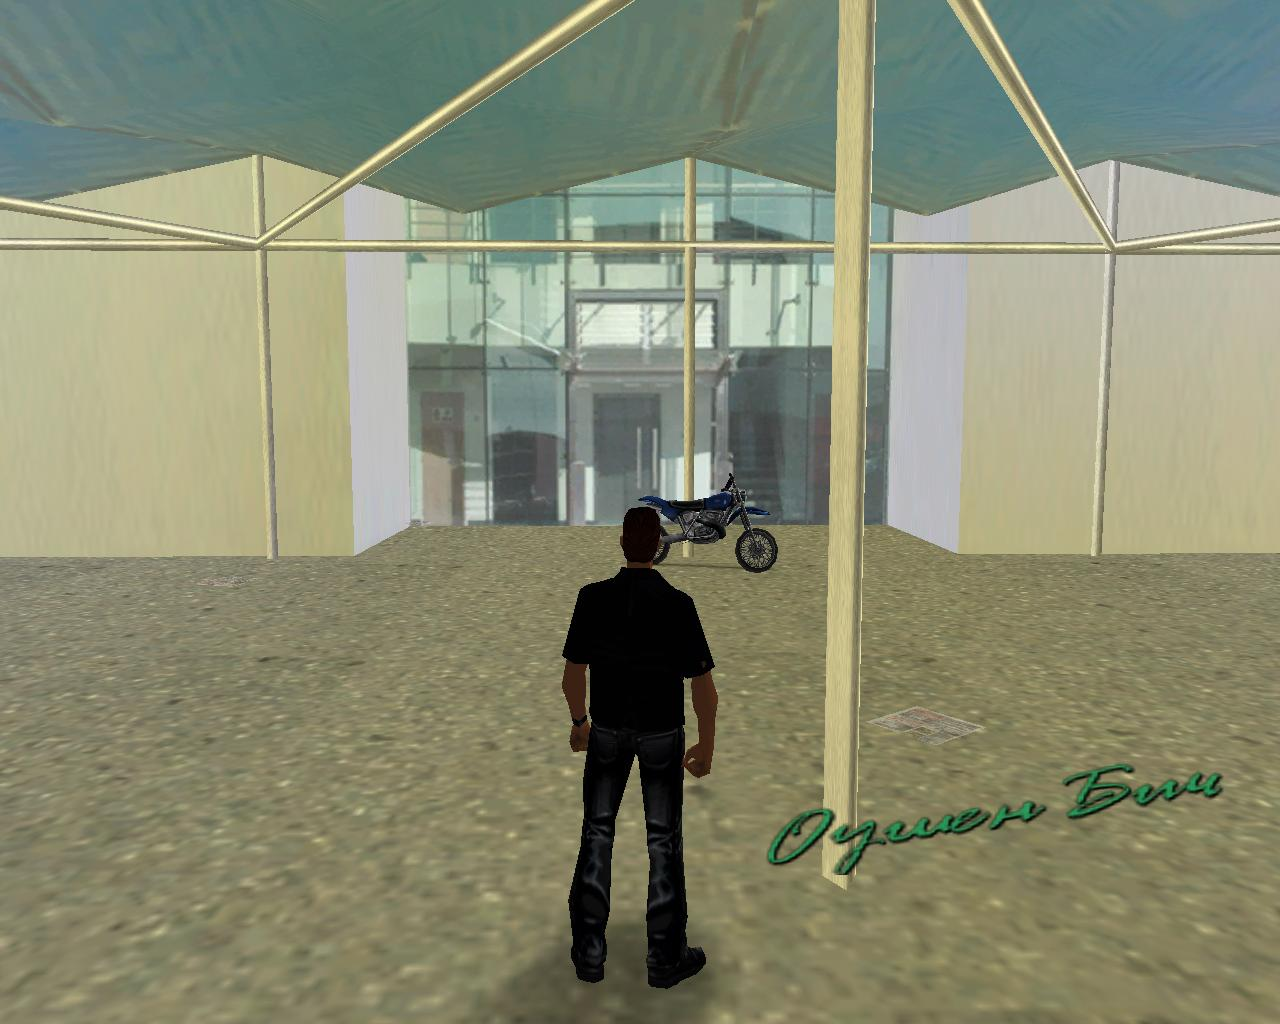 Ответ - Grand Theft Auto: Vice City Гамес